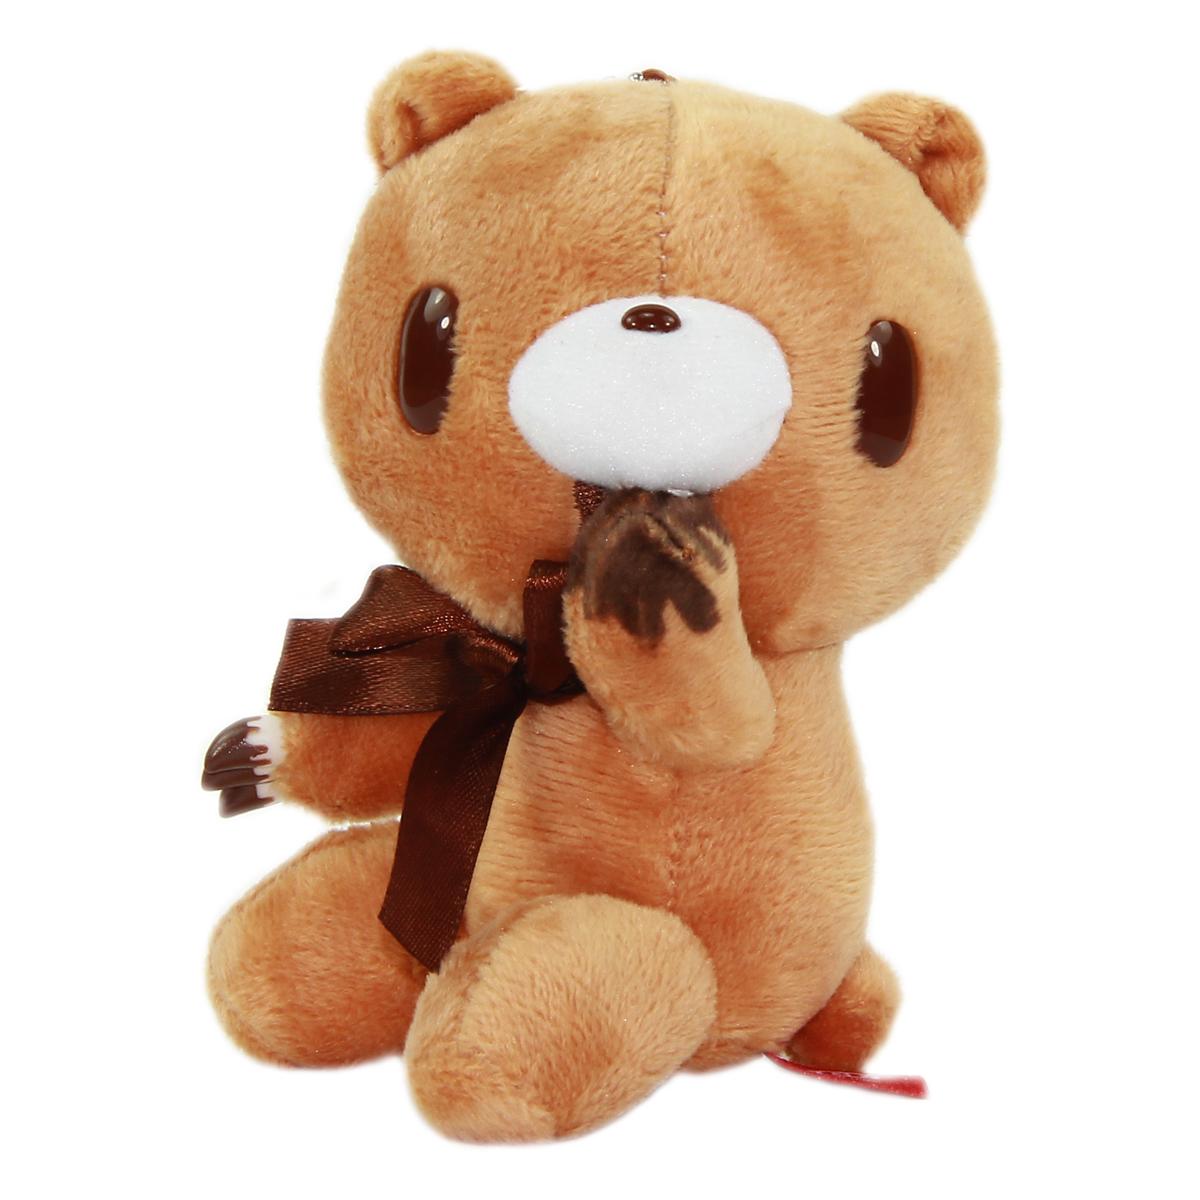 Taito Gloomy Bear Plush Doll Chocolate Sweet V & W Stuffed Animal Japan Brown